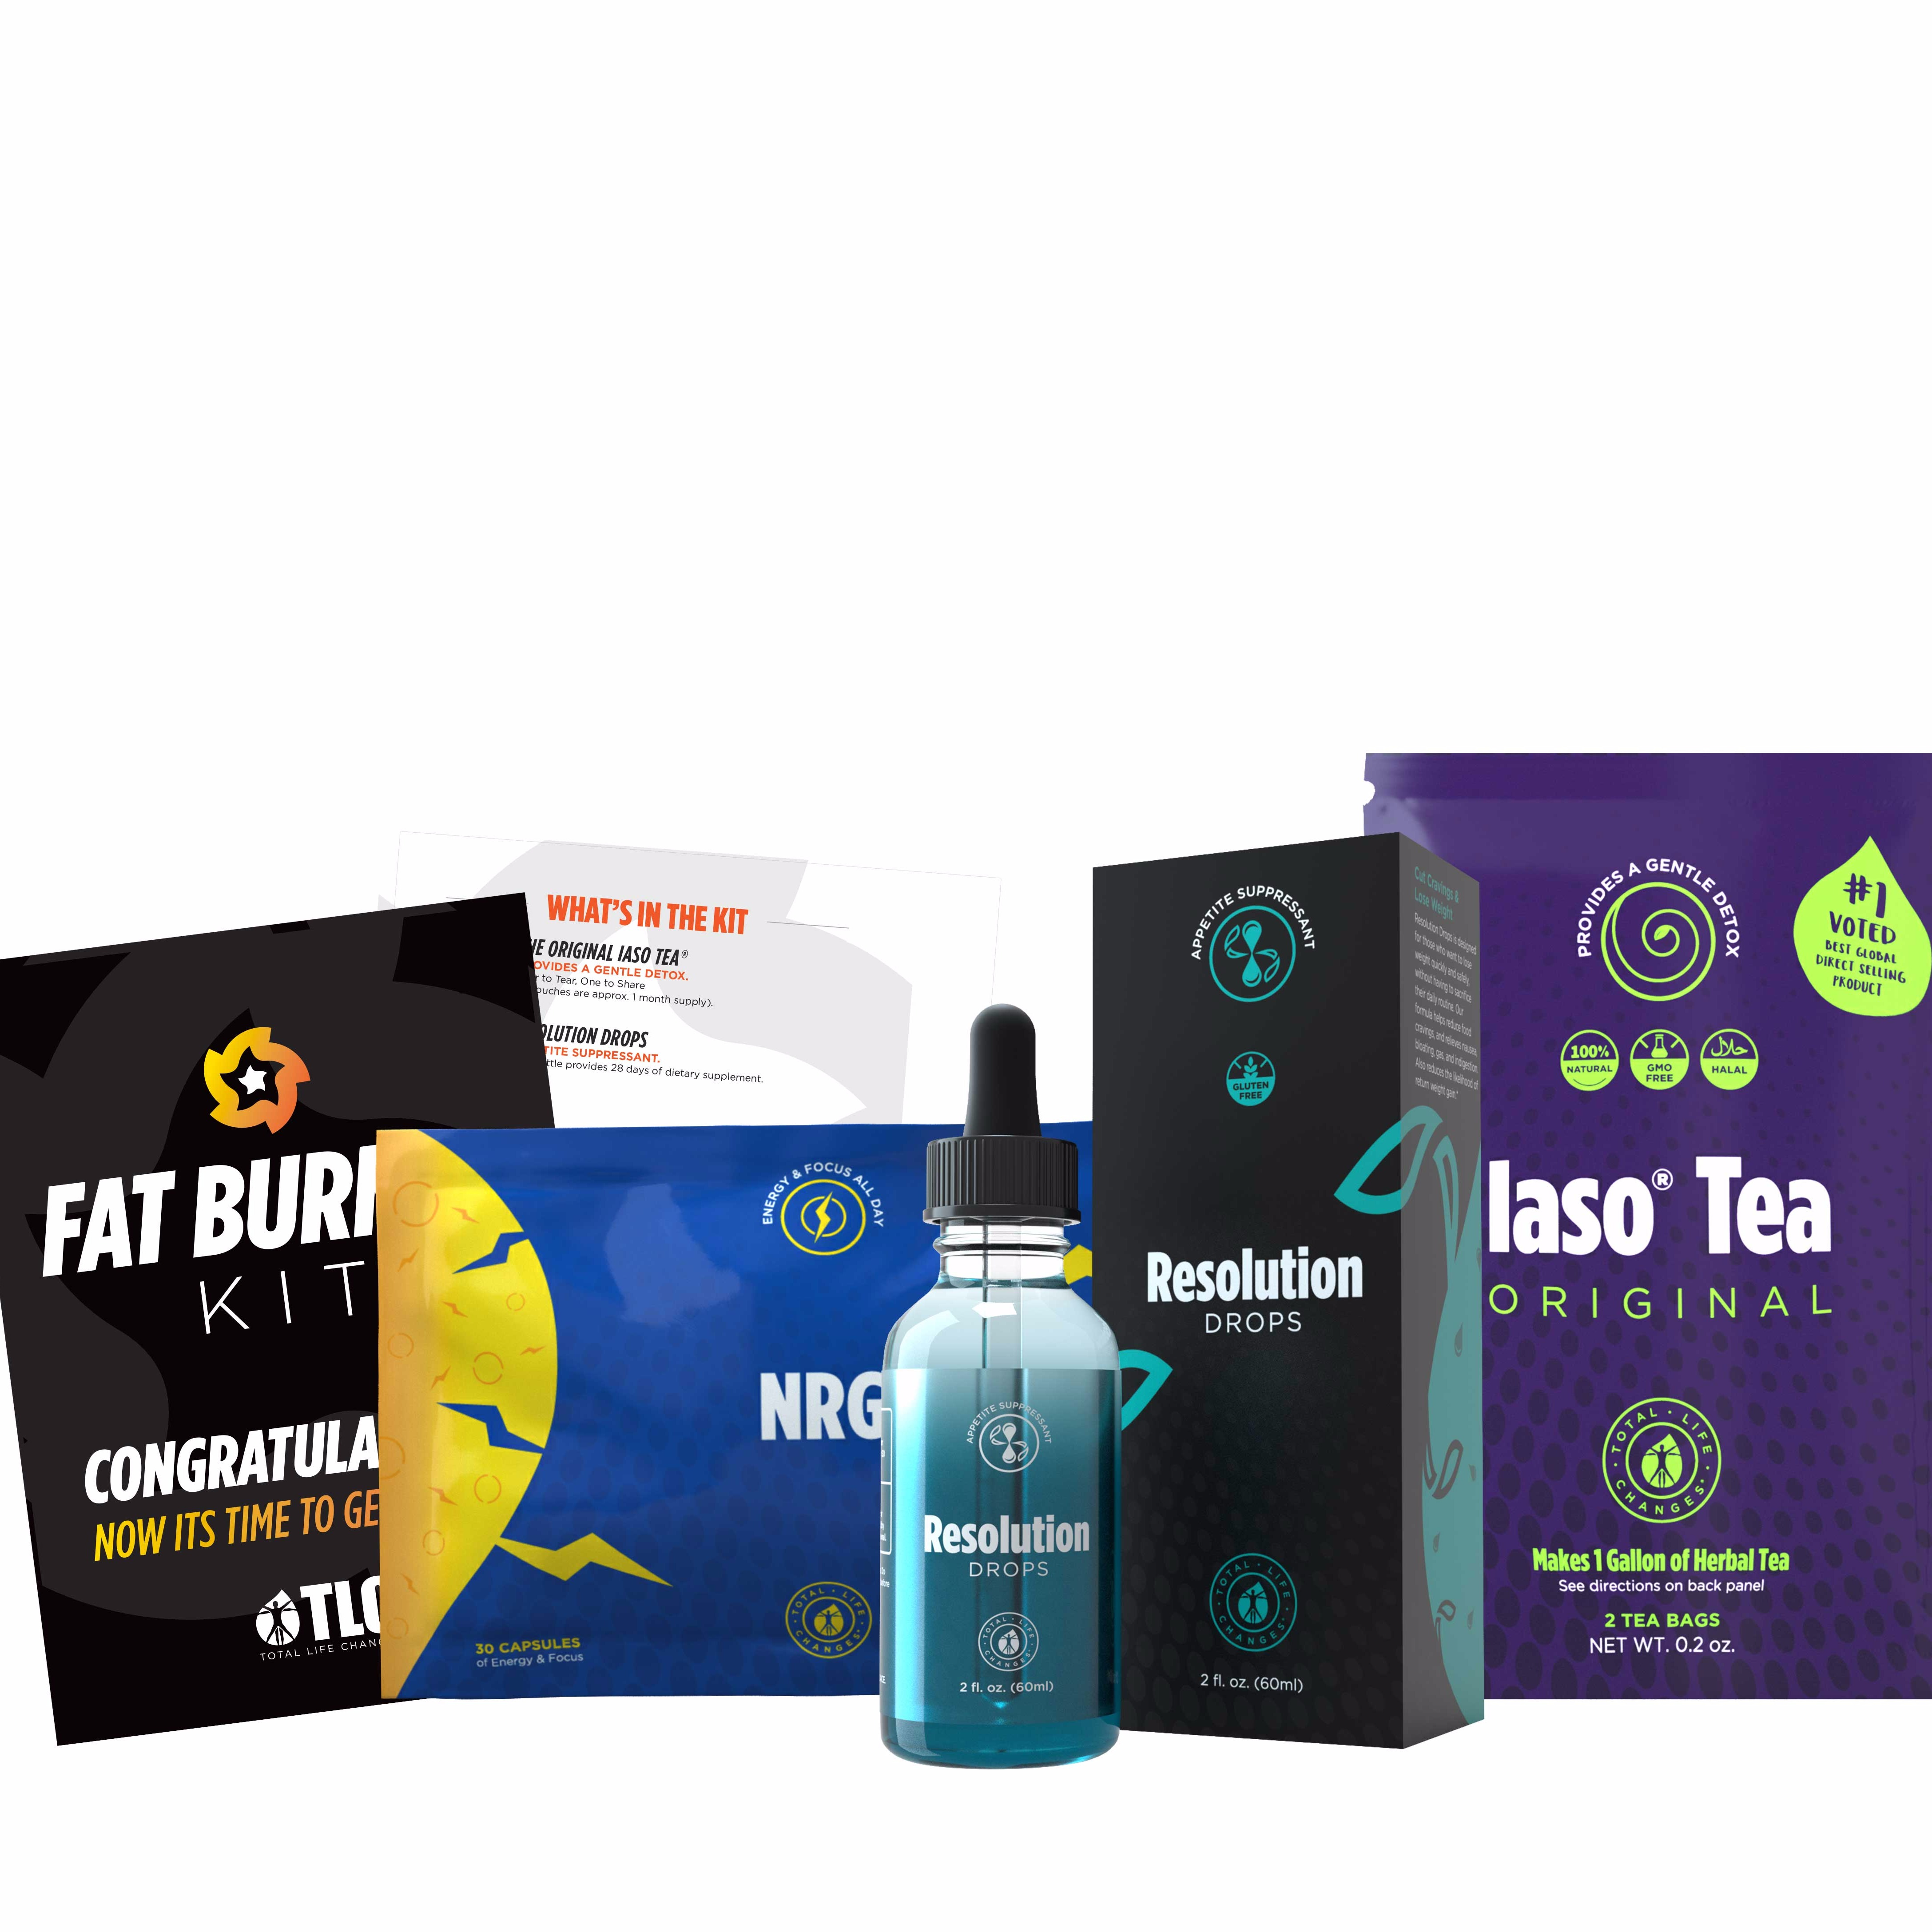 FAT BURNING KIT- FREE Meal Guide + Personal Coaching